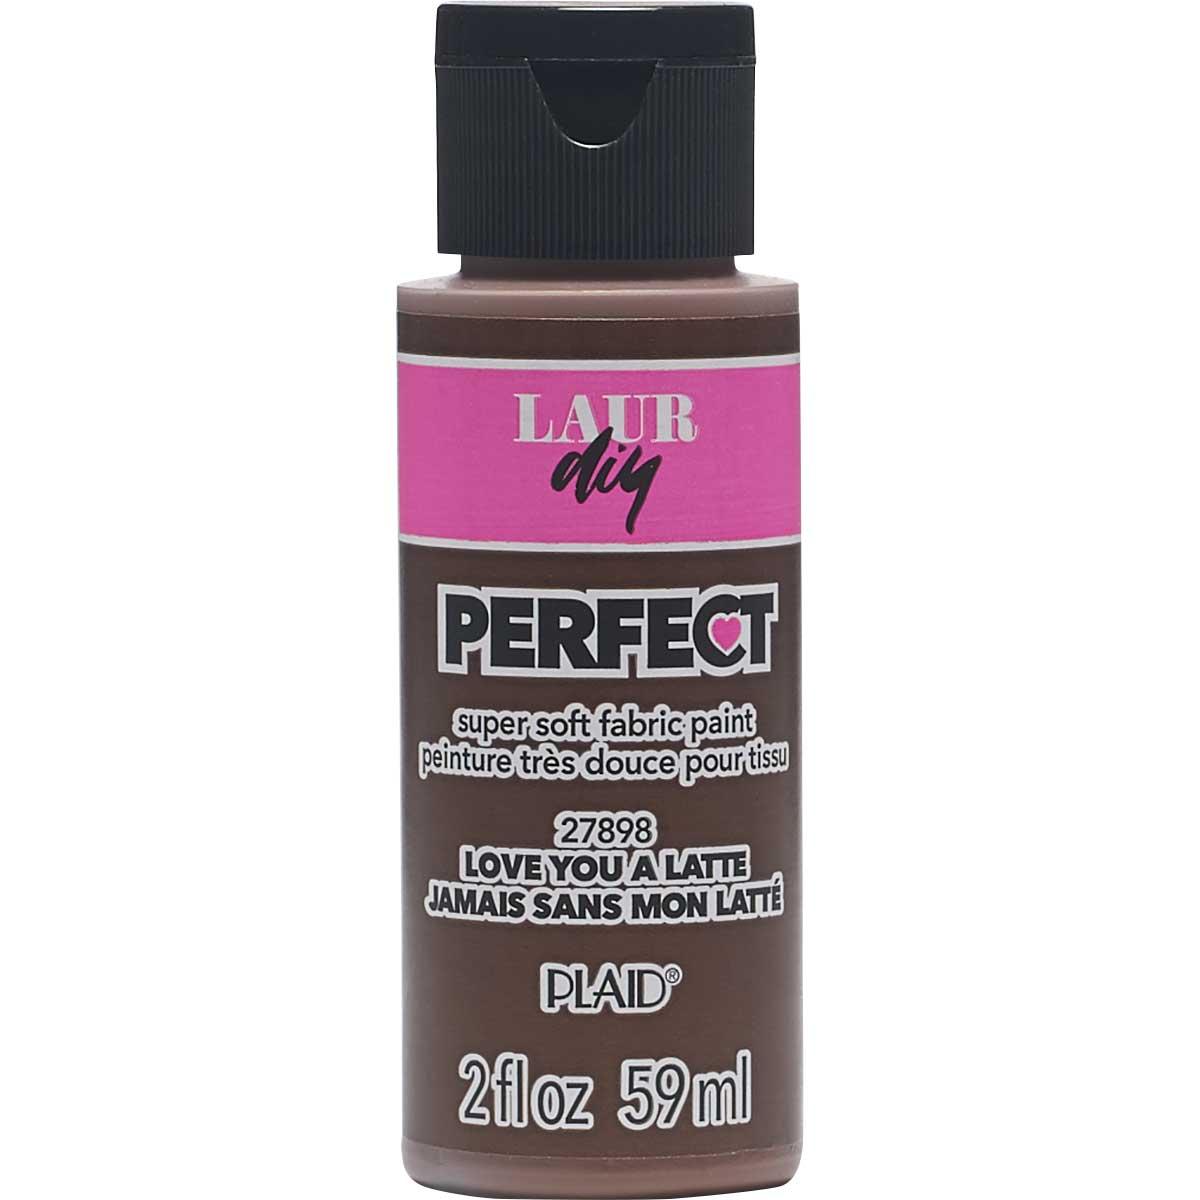 LaurDIY ® Perfect Fabric Paint - Love You A Latte, 2 oz.